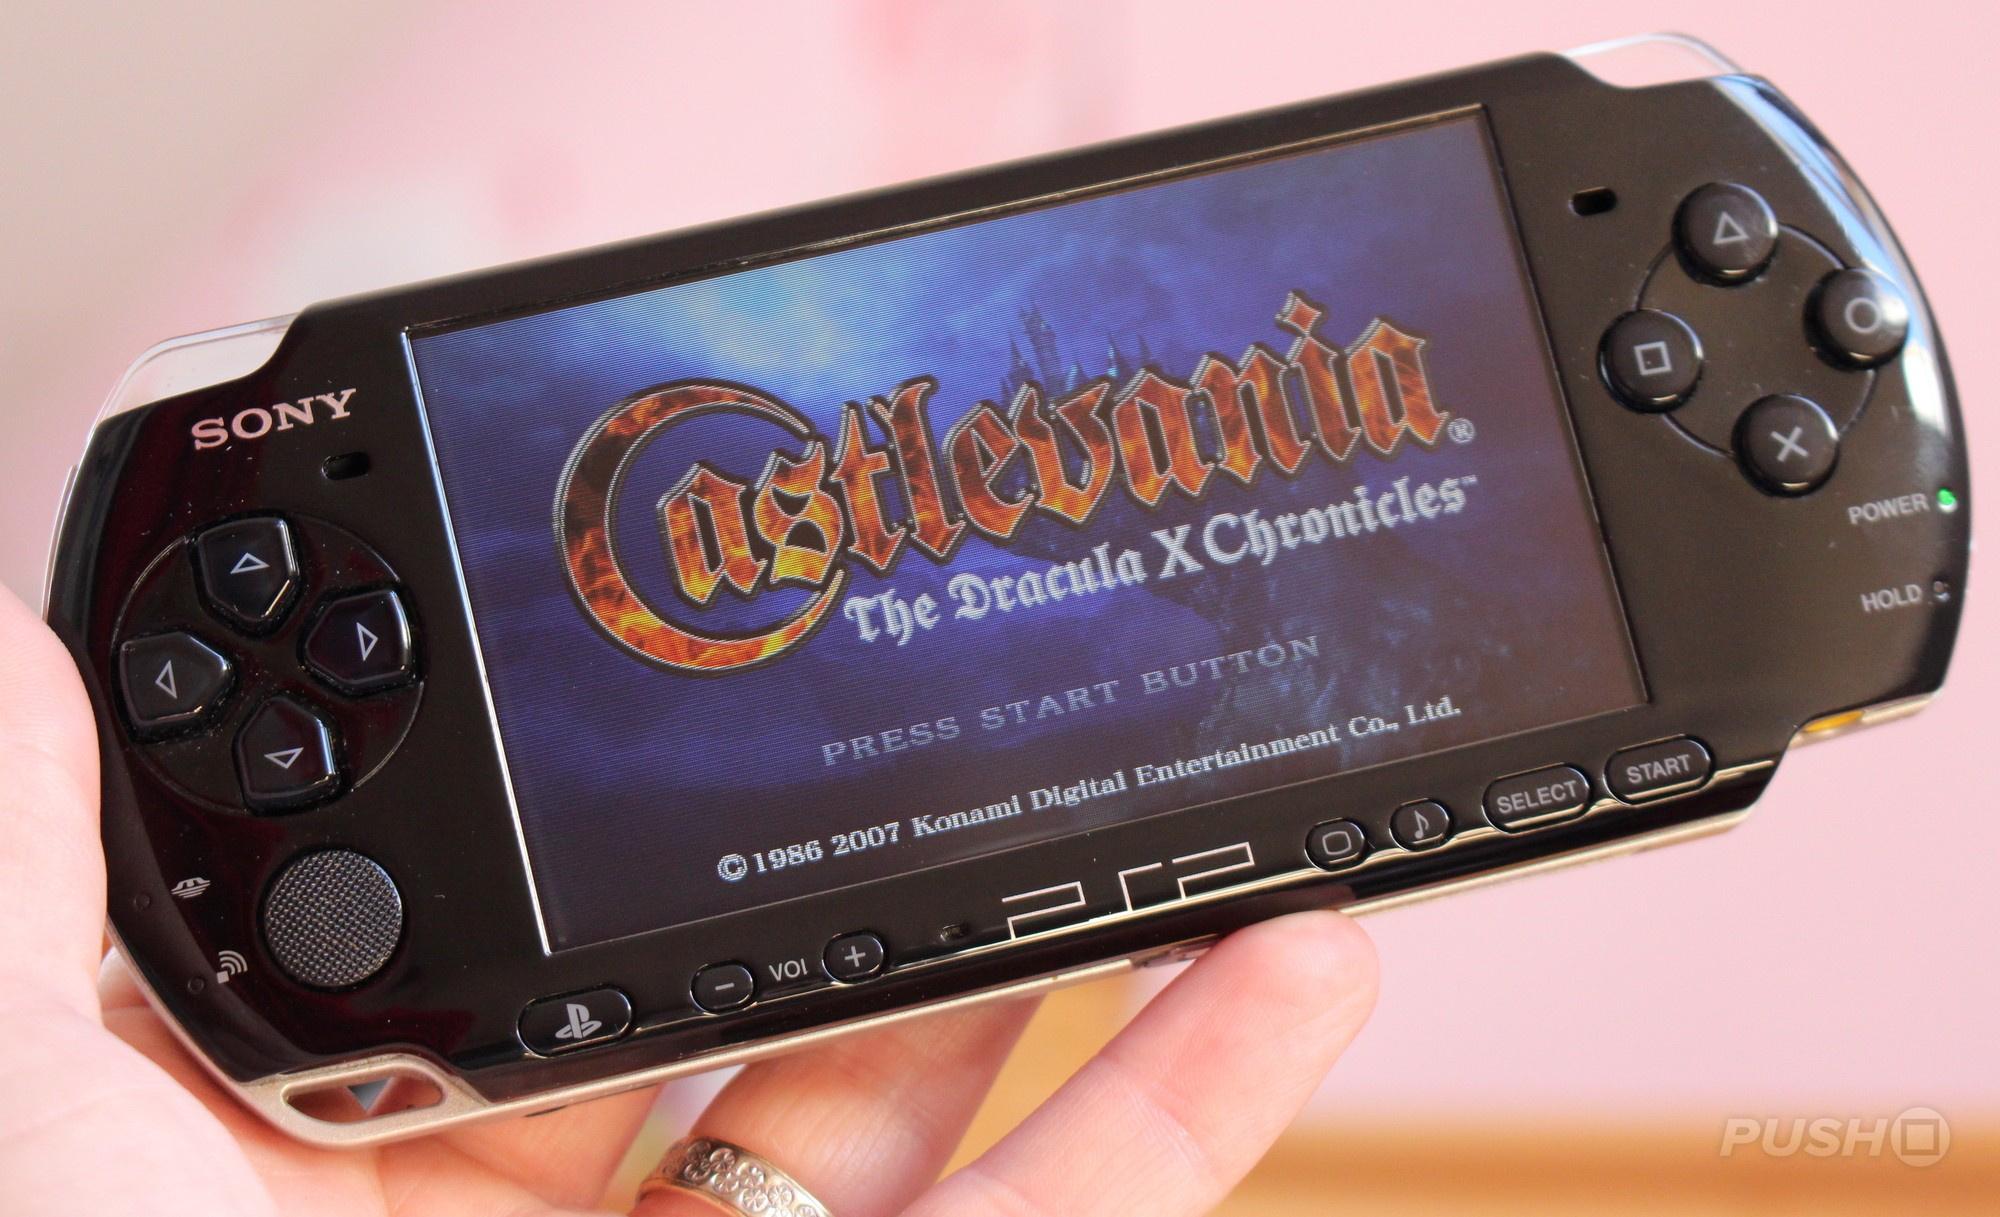 It's Time to Celebrate the PSP, Sony's 21st Century Walkman